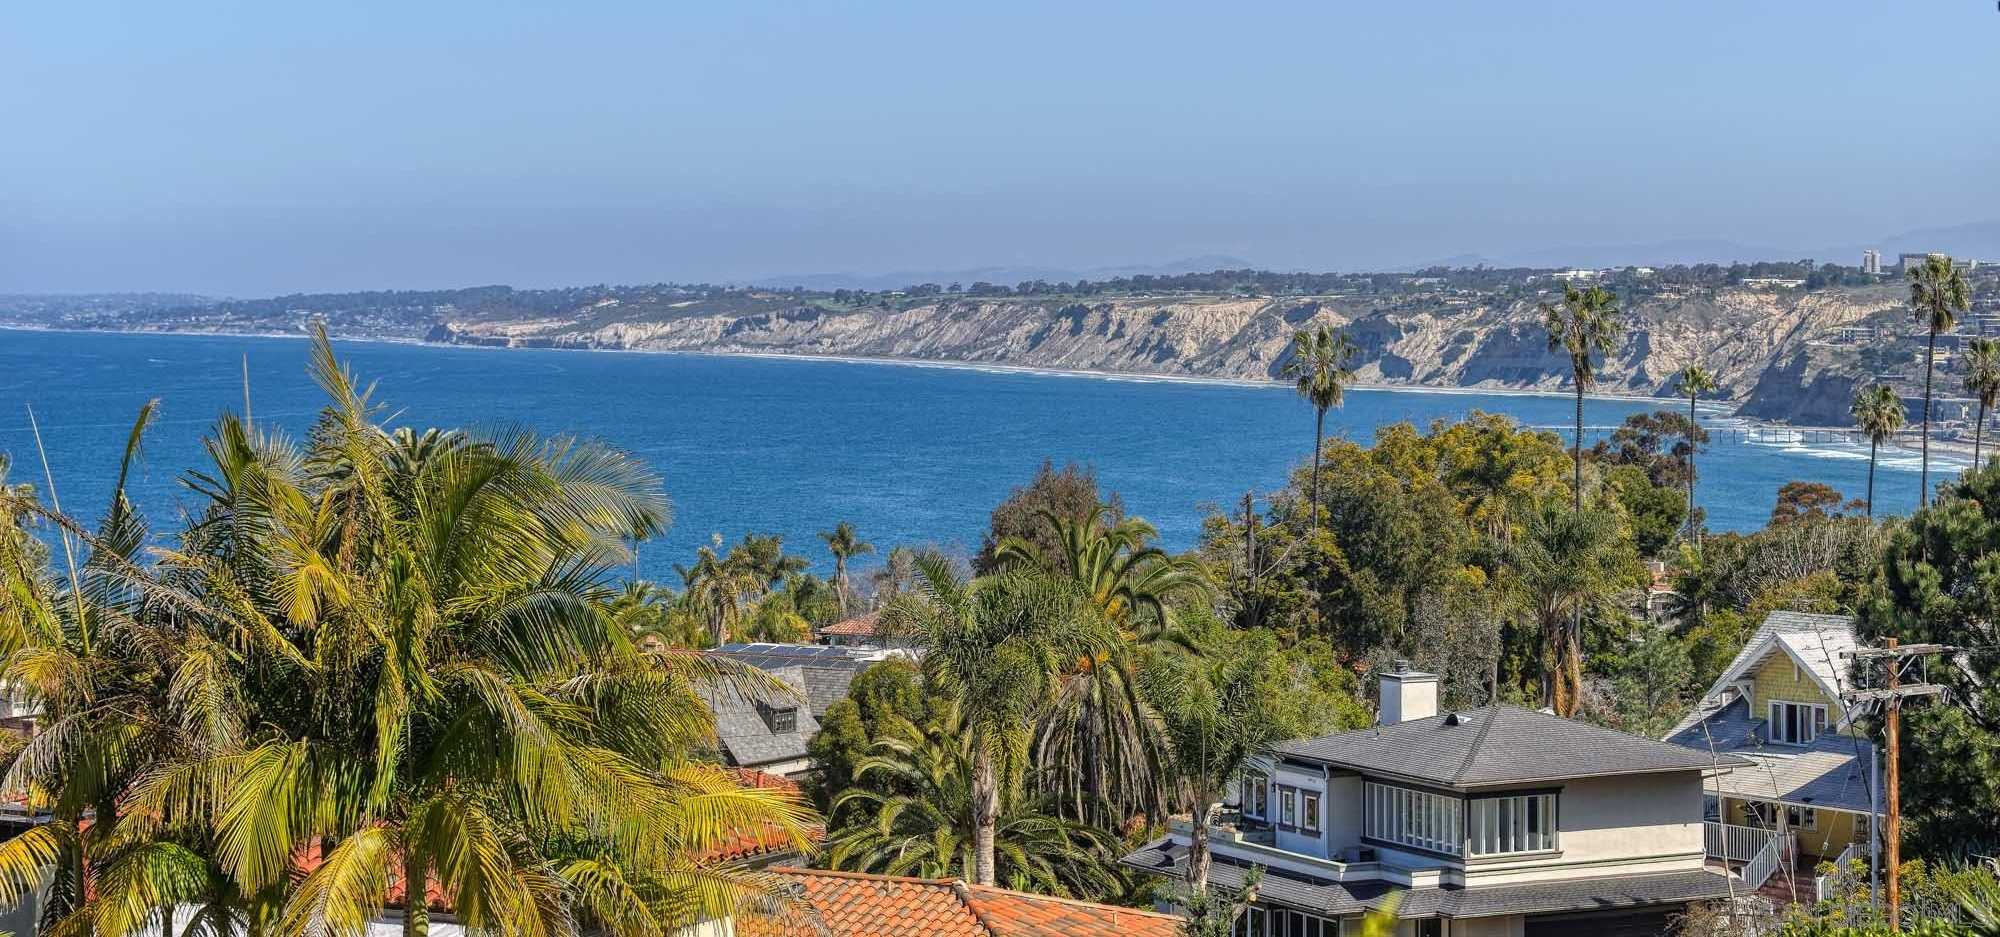 $2,395,000 - 3Br/3Ba -  for Sale in Country Club, La Jolla